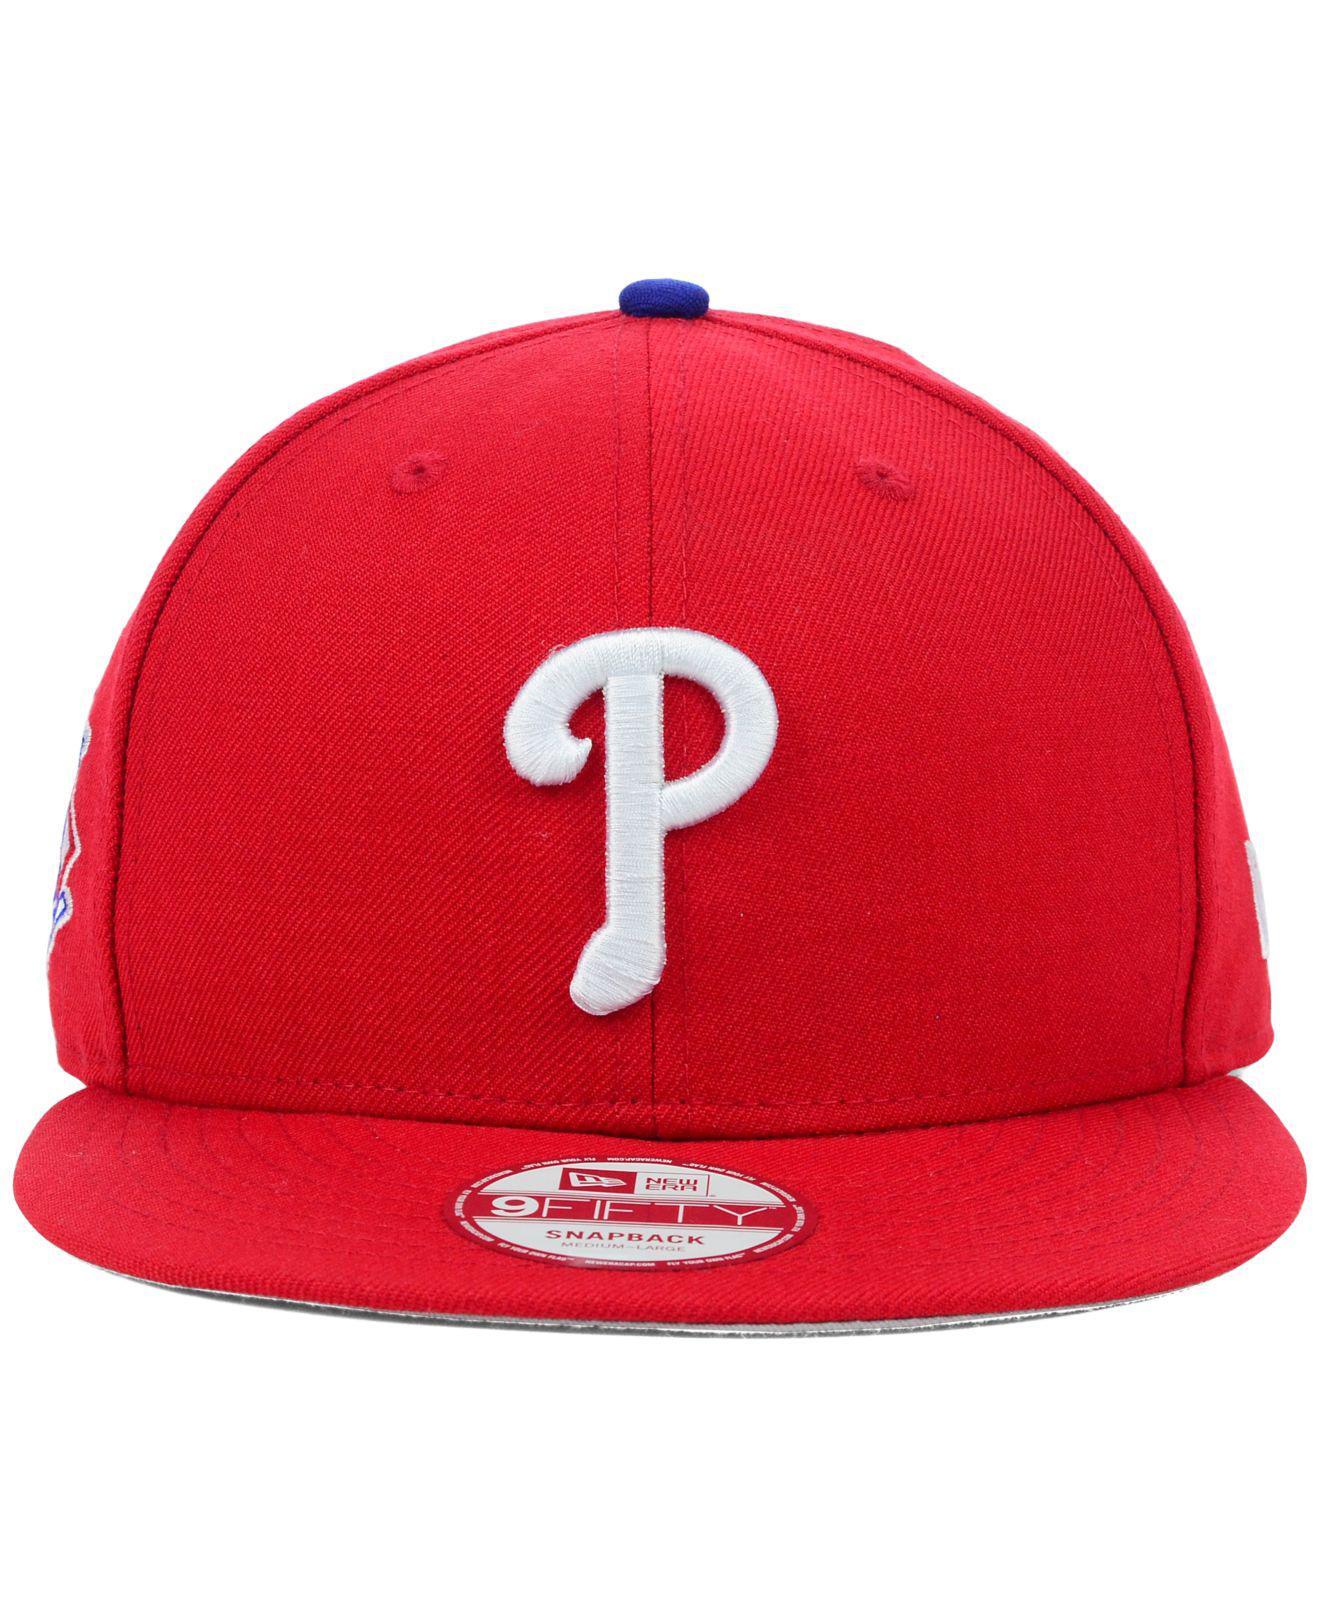 919c9bb1235 Lyst - KTZ Philadelphia Phillies Mlb 2 Tone Link 9fifty Snapback Cap in Red  for Men